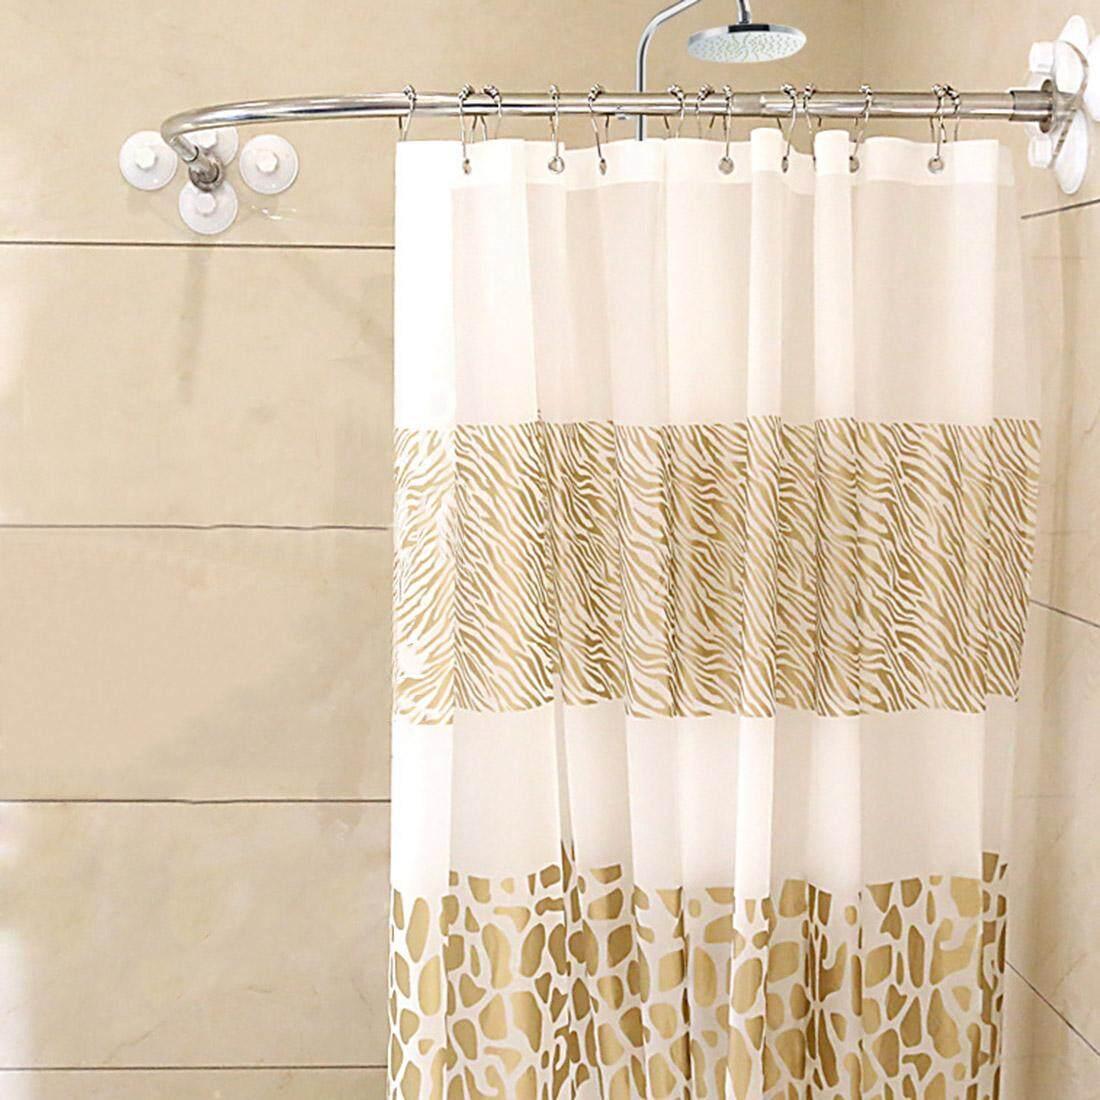 Hot Selling Shower Curtain Curved Rail U Shape Single Way Track Rod Pole Bath Set Set No Punching Bath Curtain Rod